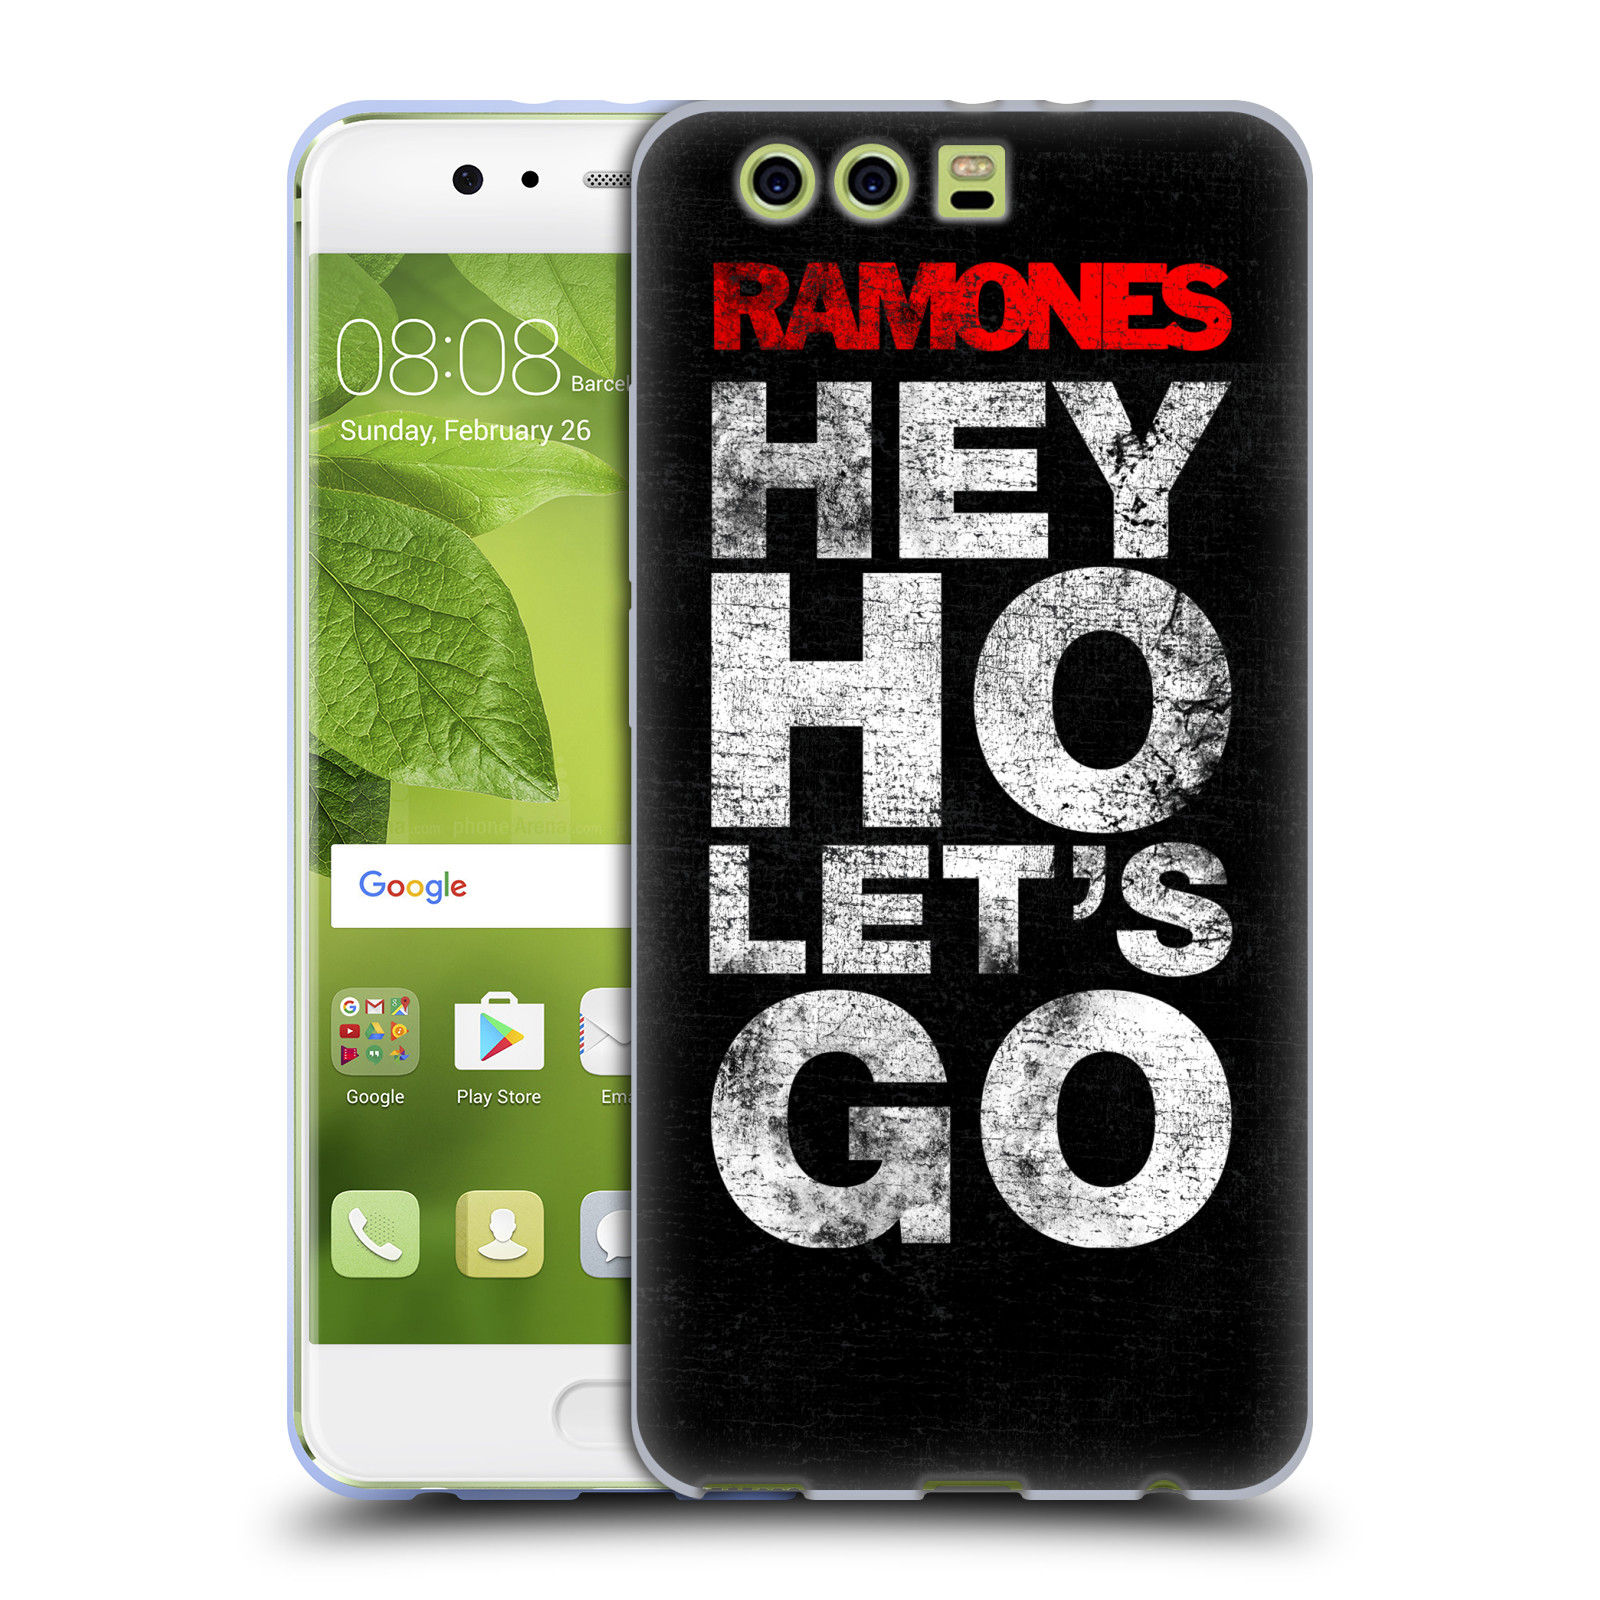 Silikonové pouzdro na mobil Huawei P10 Plus - Head Case The Ramones - HEY HO LET´S GO (Silikonový kryt či obal na mobilní telefon s oficiálním licencovaným motivem The Ramones pro Huawei P10 Plus (Dual SIM))